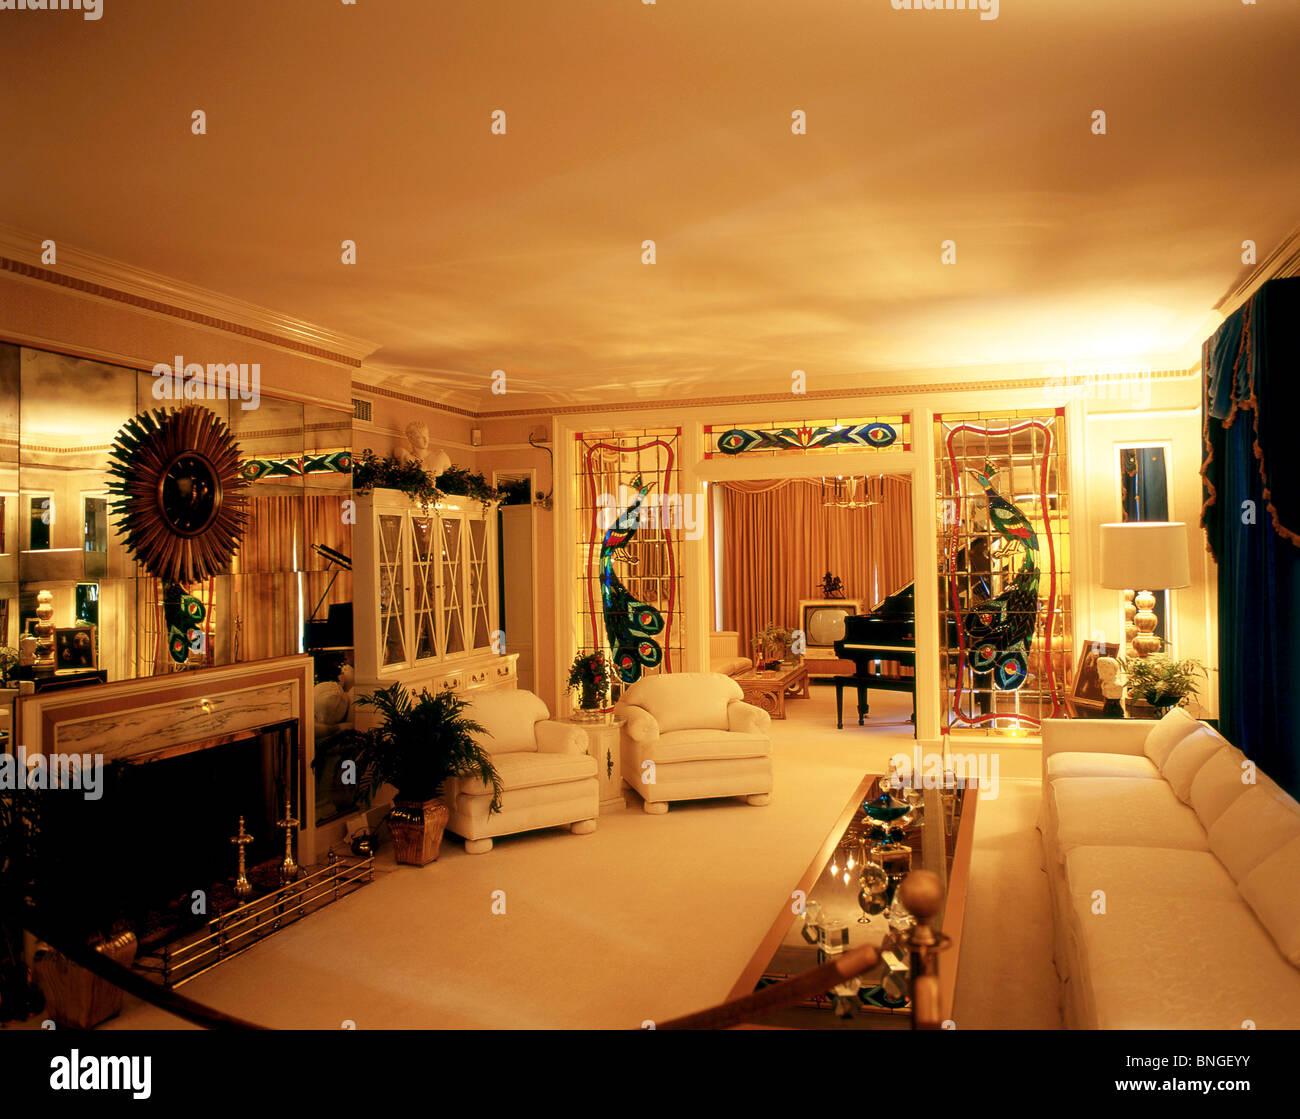 The Living Room Graceland Mansion Elvis Presley Boulevard Whitehaven Memphis Tennessee United States Of America